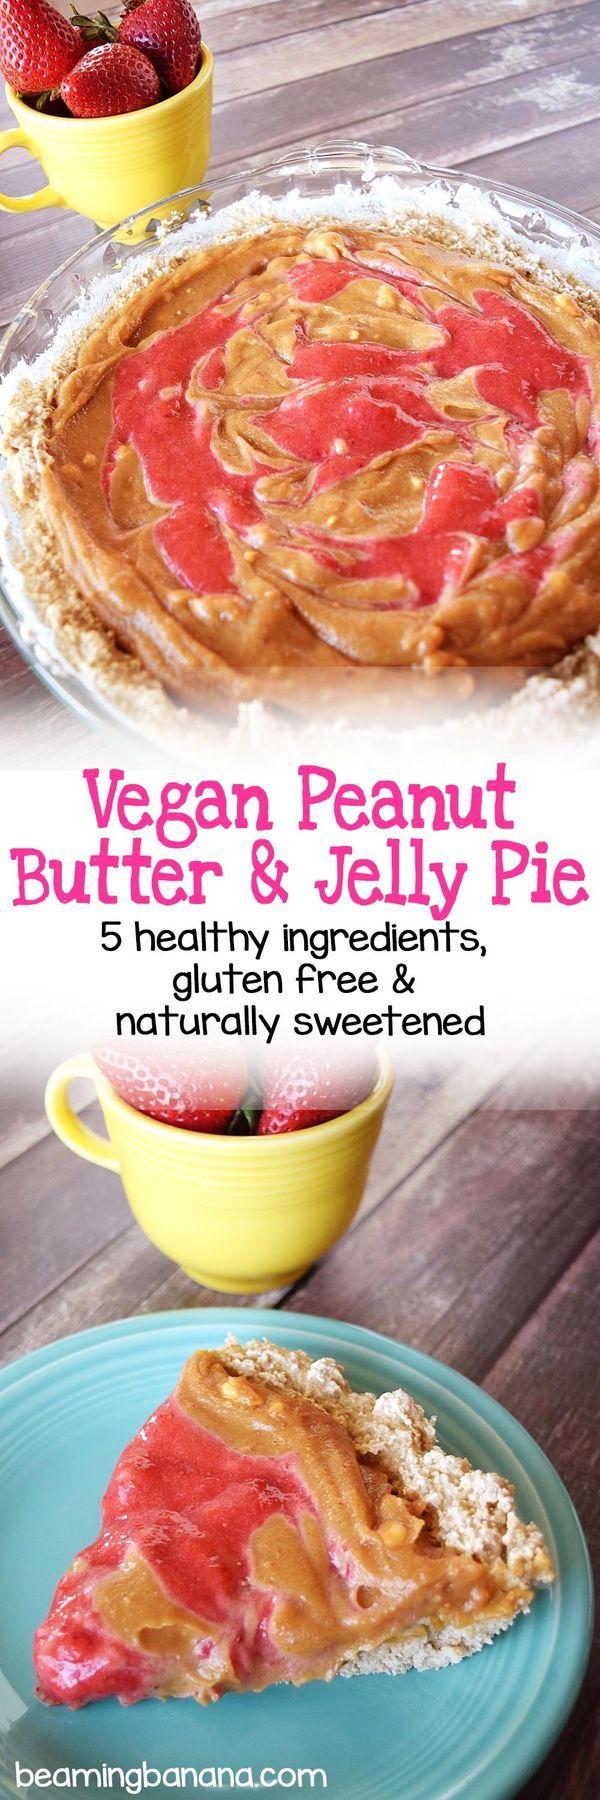 84 best Veggie treats images on Pinterest